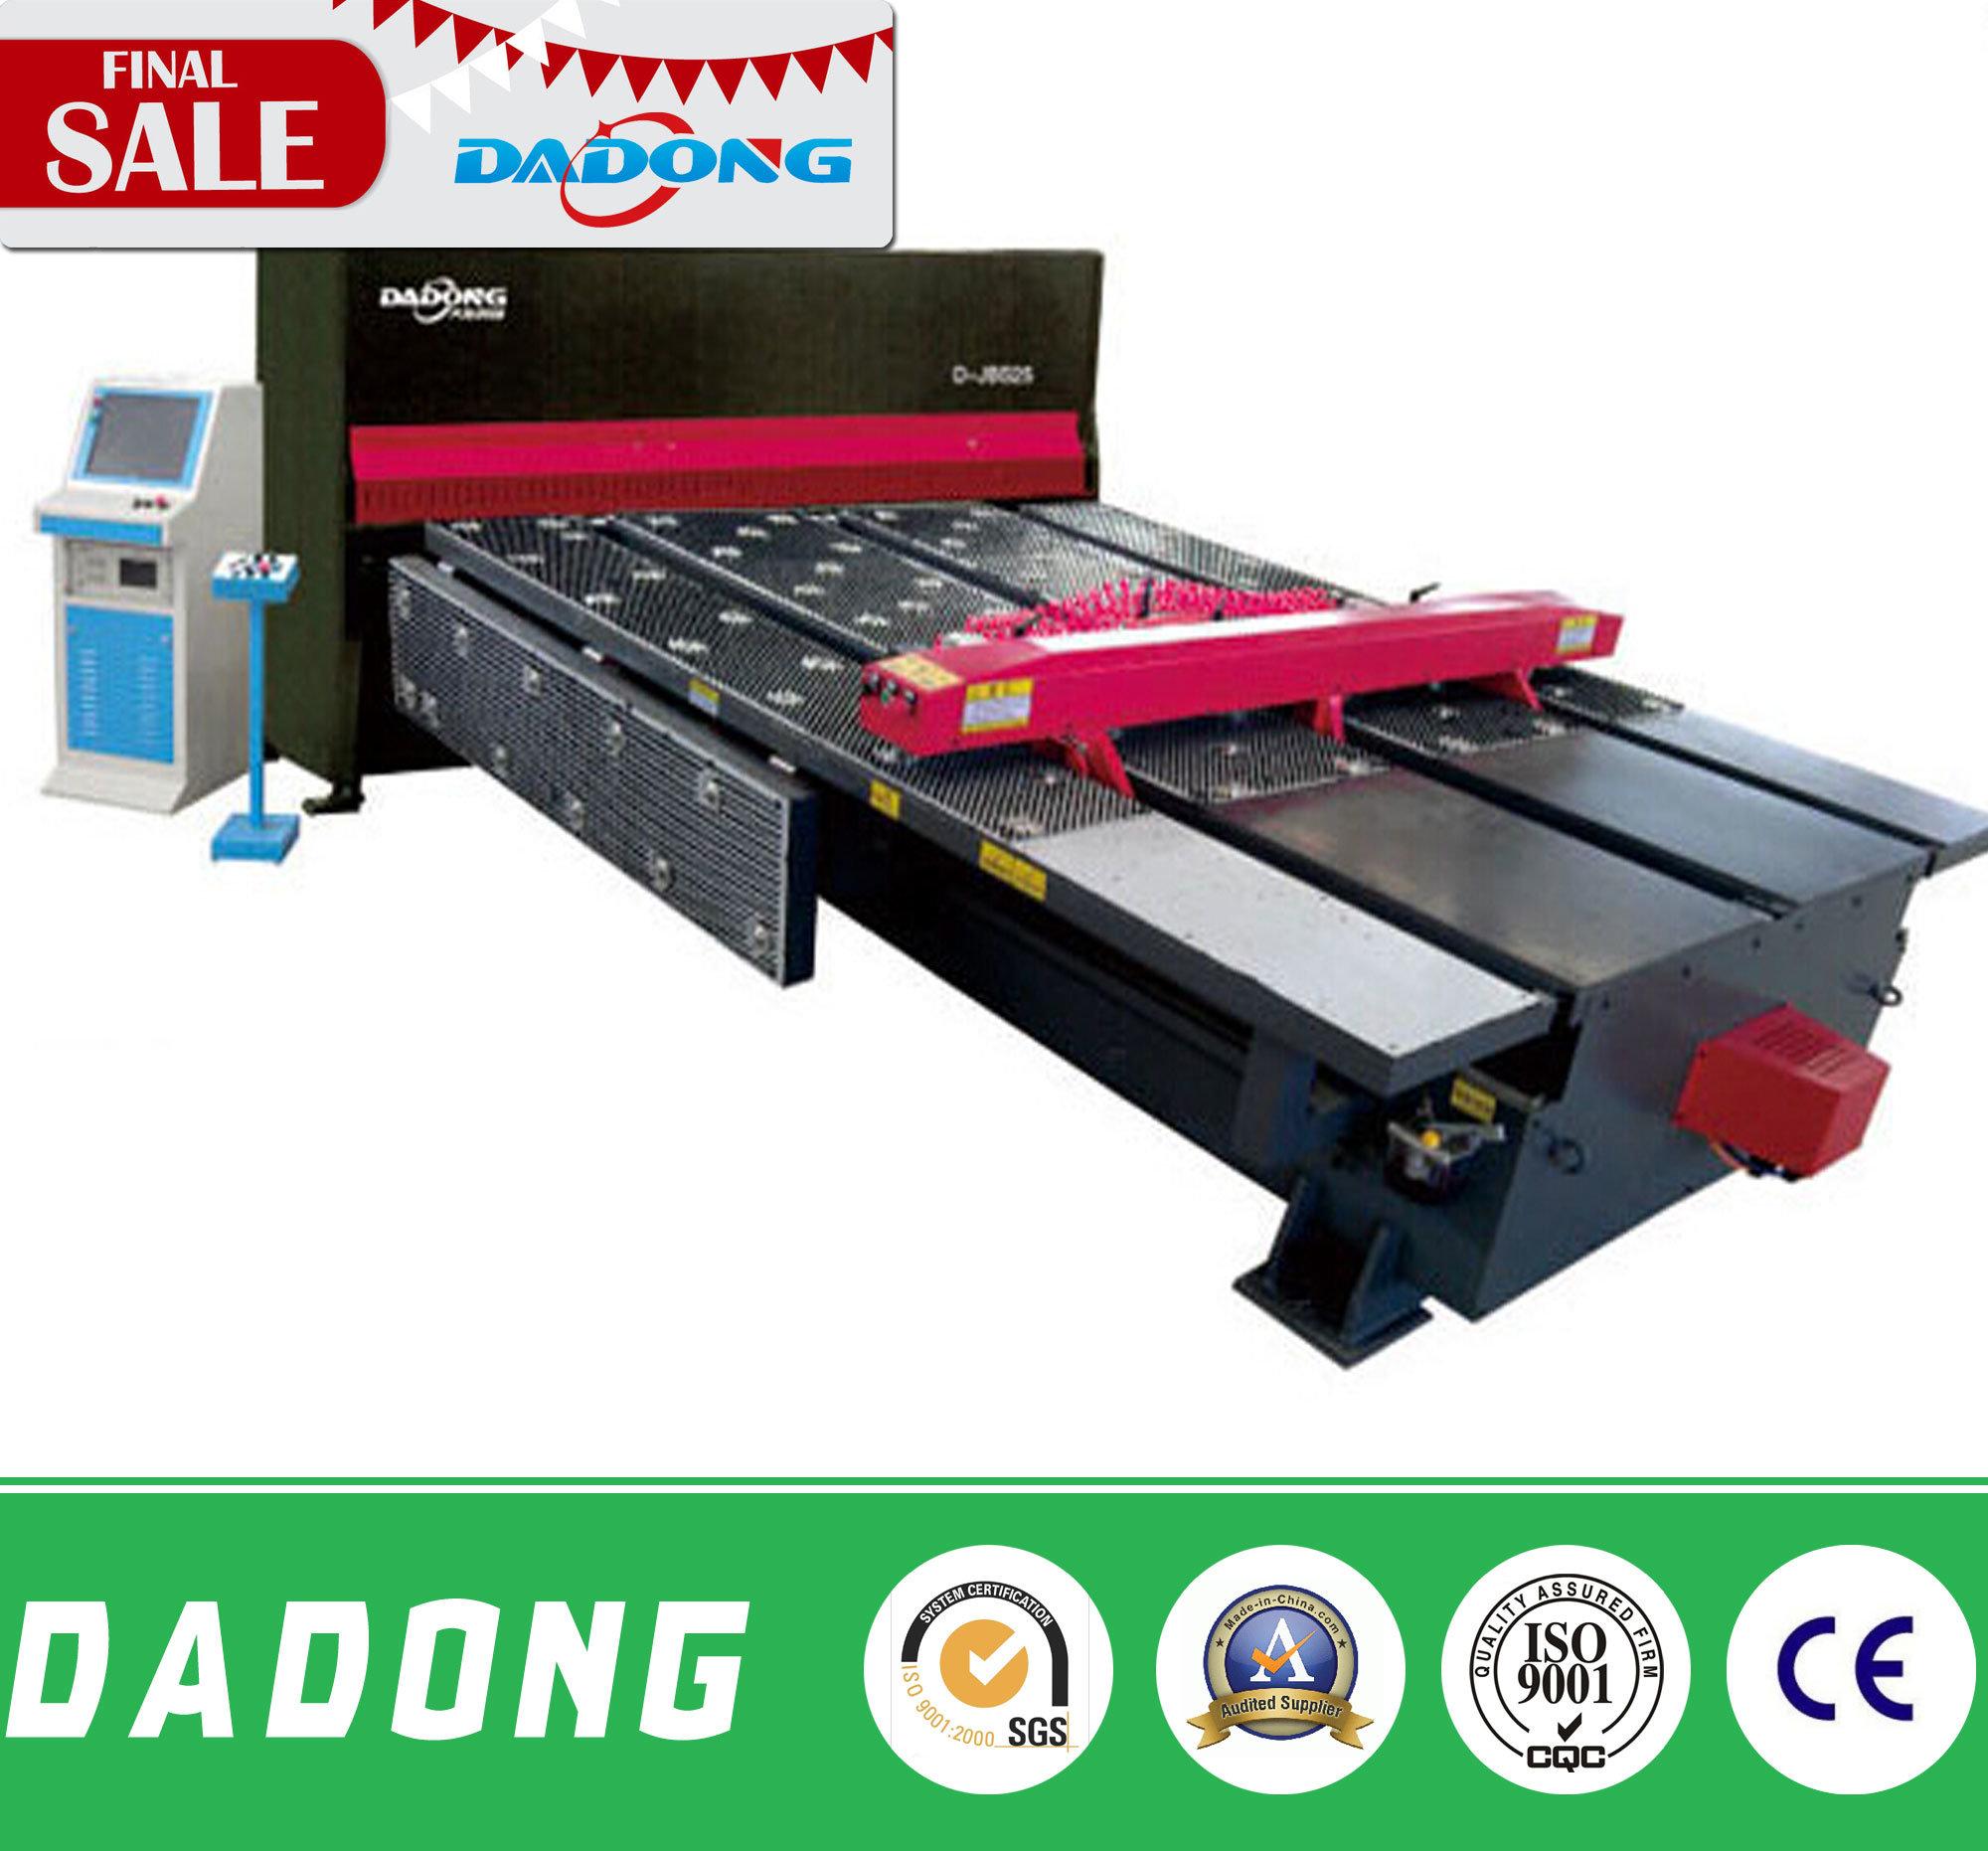 High Speed Machine Tool/High Precision Swiss Type CNC Automatic Lathe